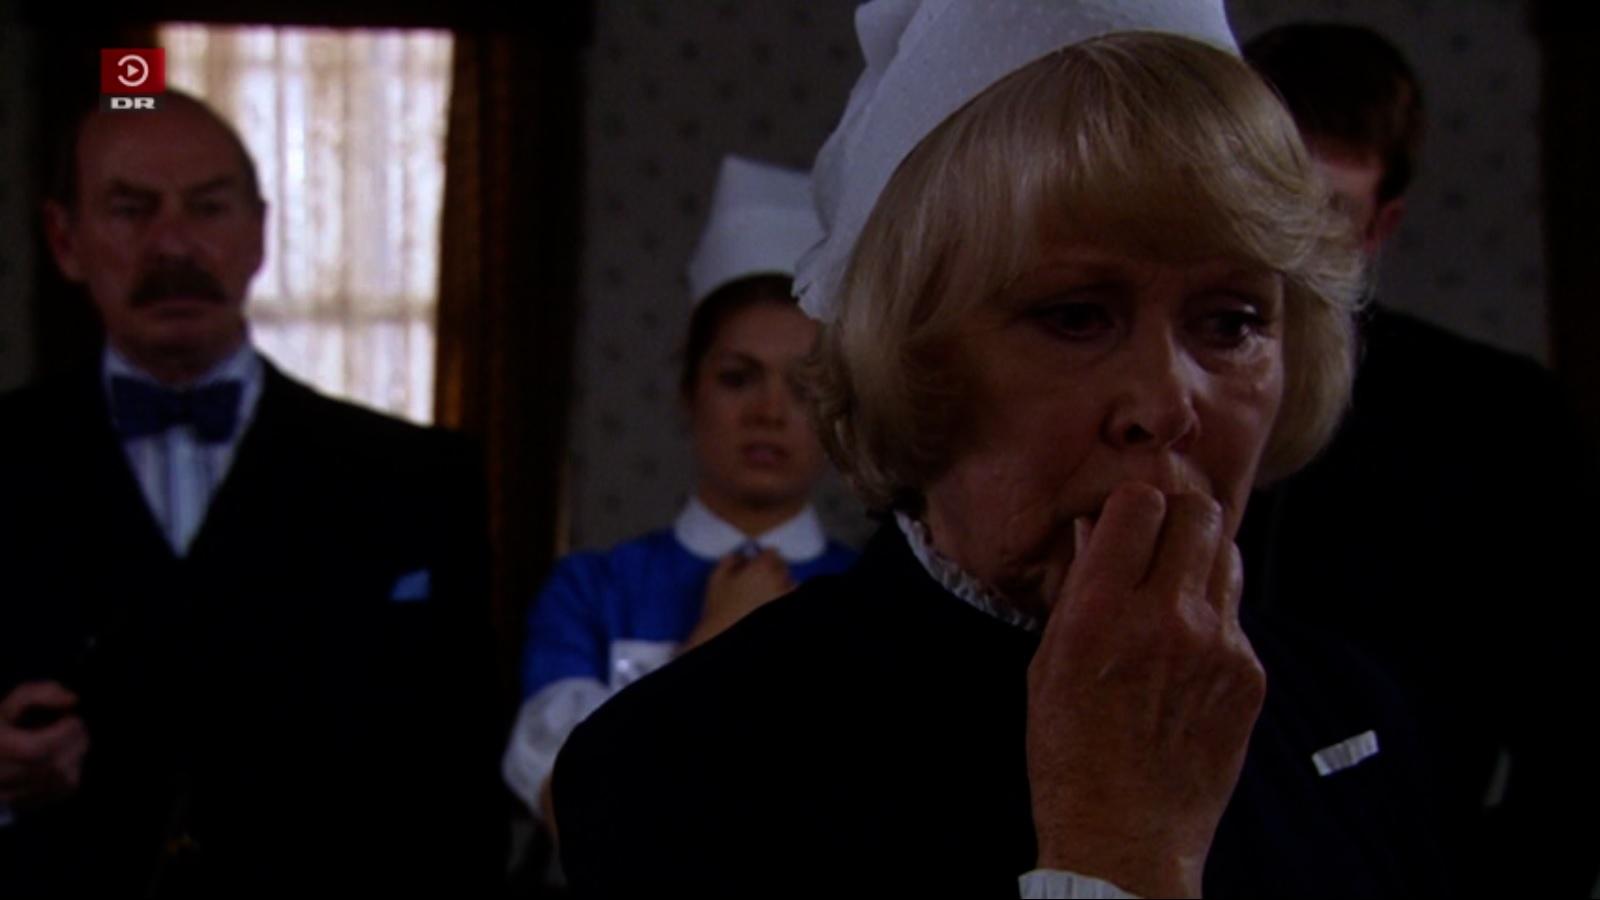 Wendy Craig, Denis Lill, Kari Corbett, and Damian O'Hare in The Royal (2003)